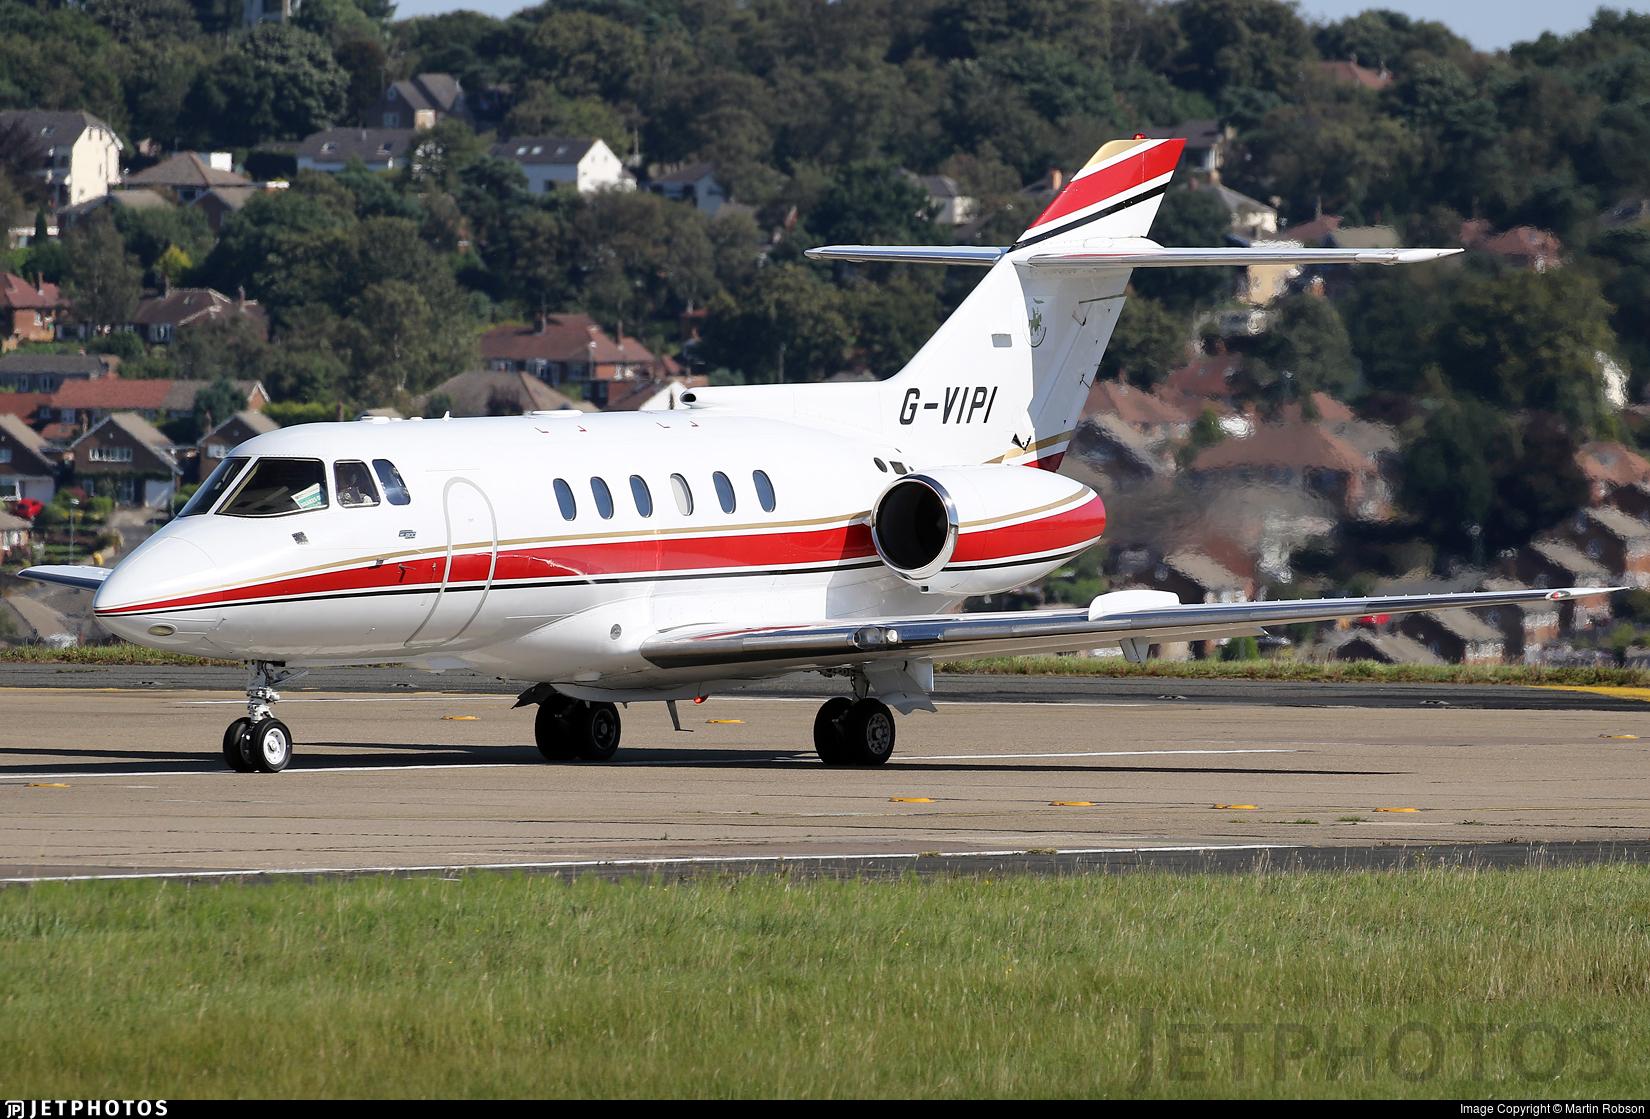 G-VIPI - British Aerospace BAe 125-800B - Private